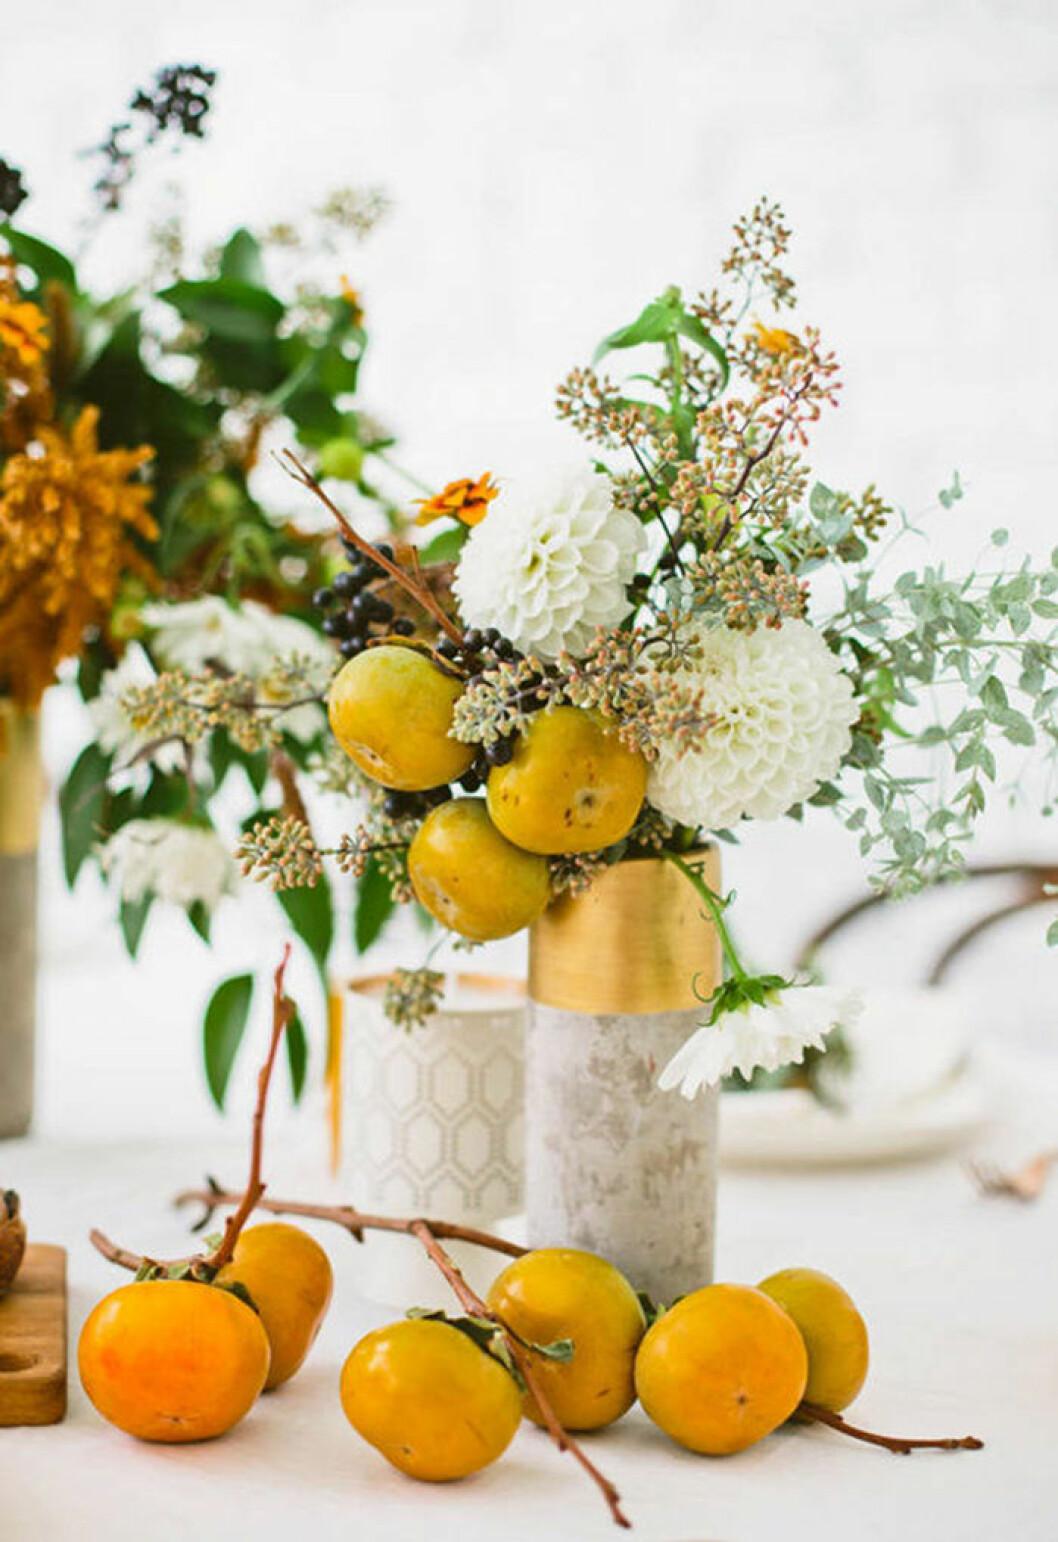 Blombukett med persimon